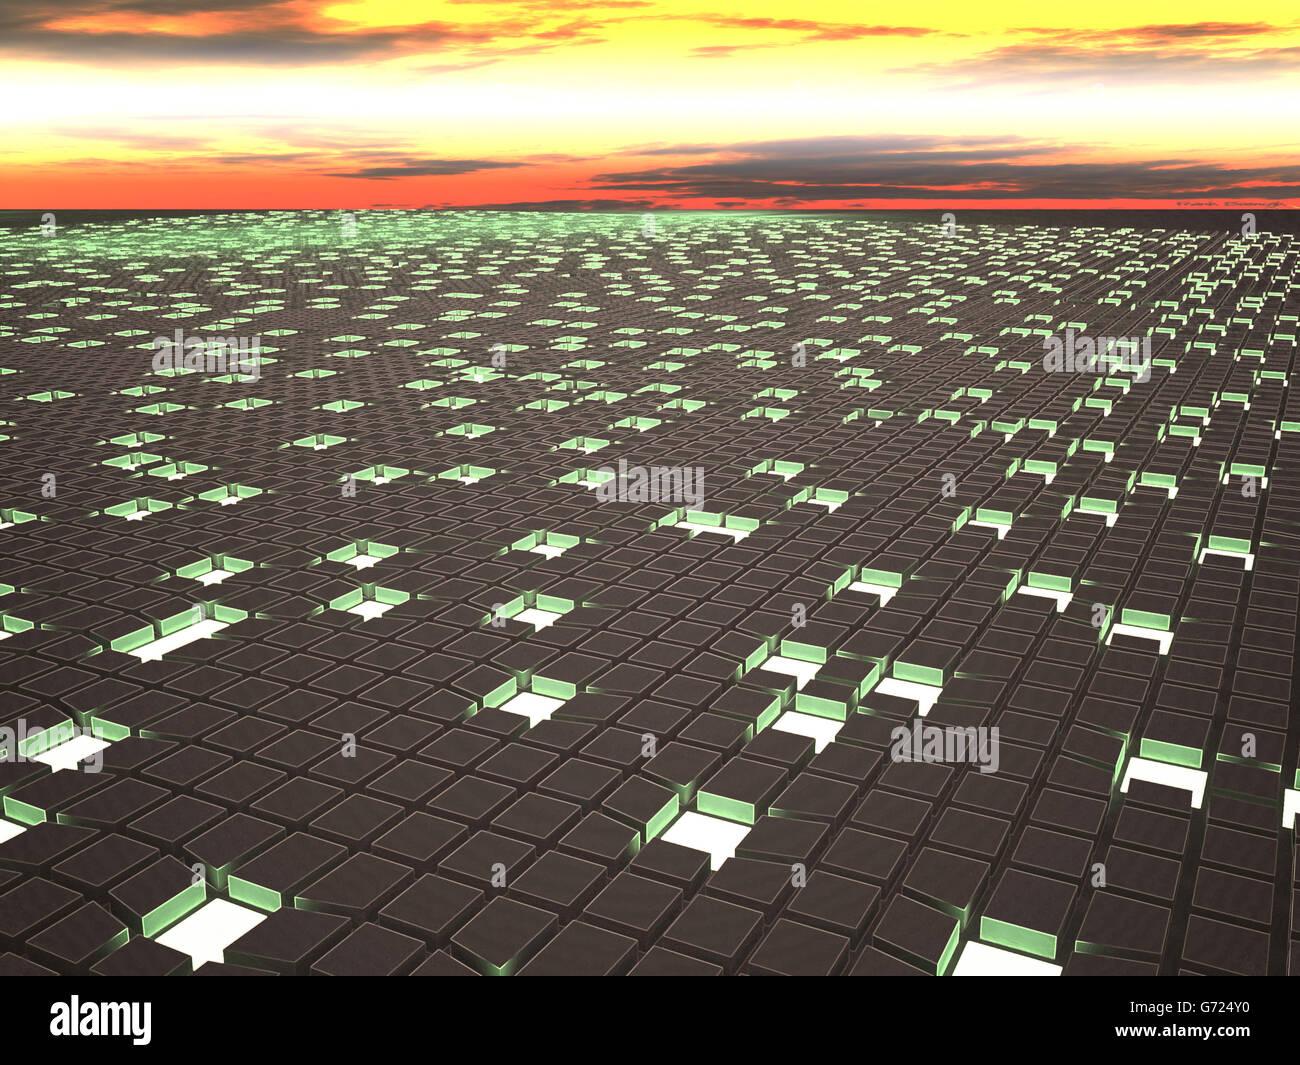 Green energy concept, illustration - Stock Image